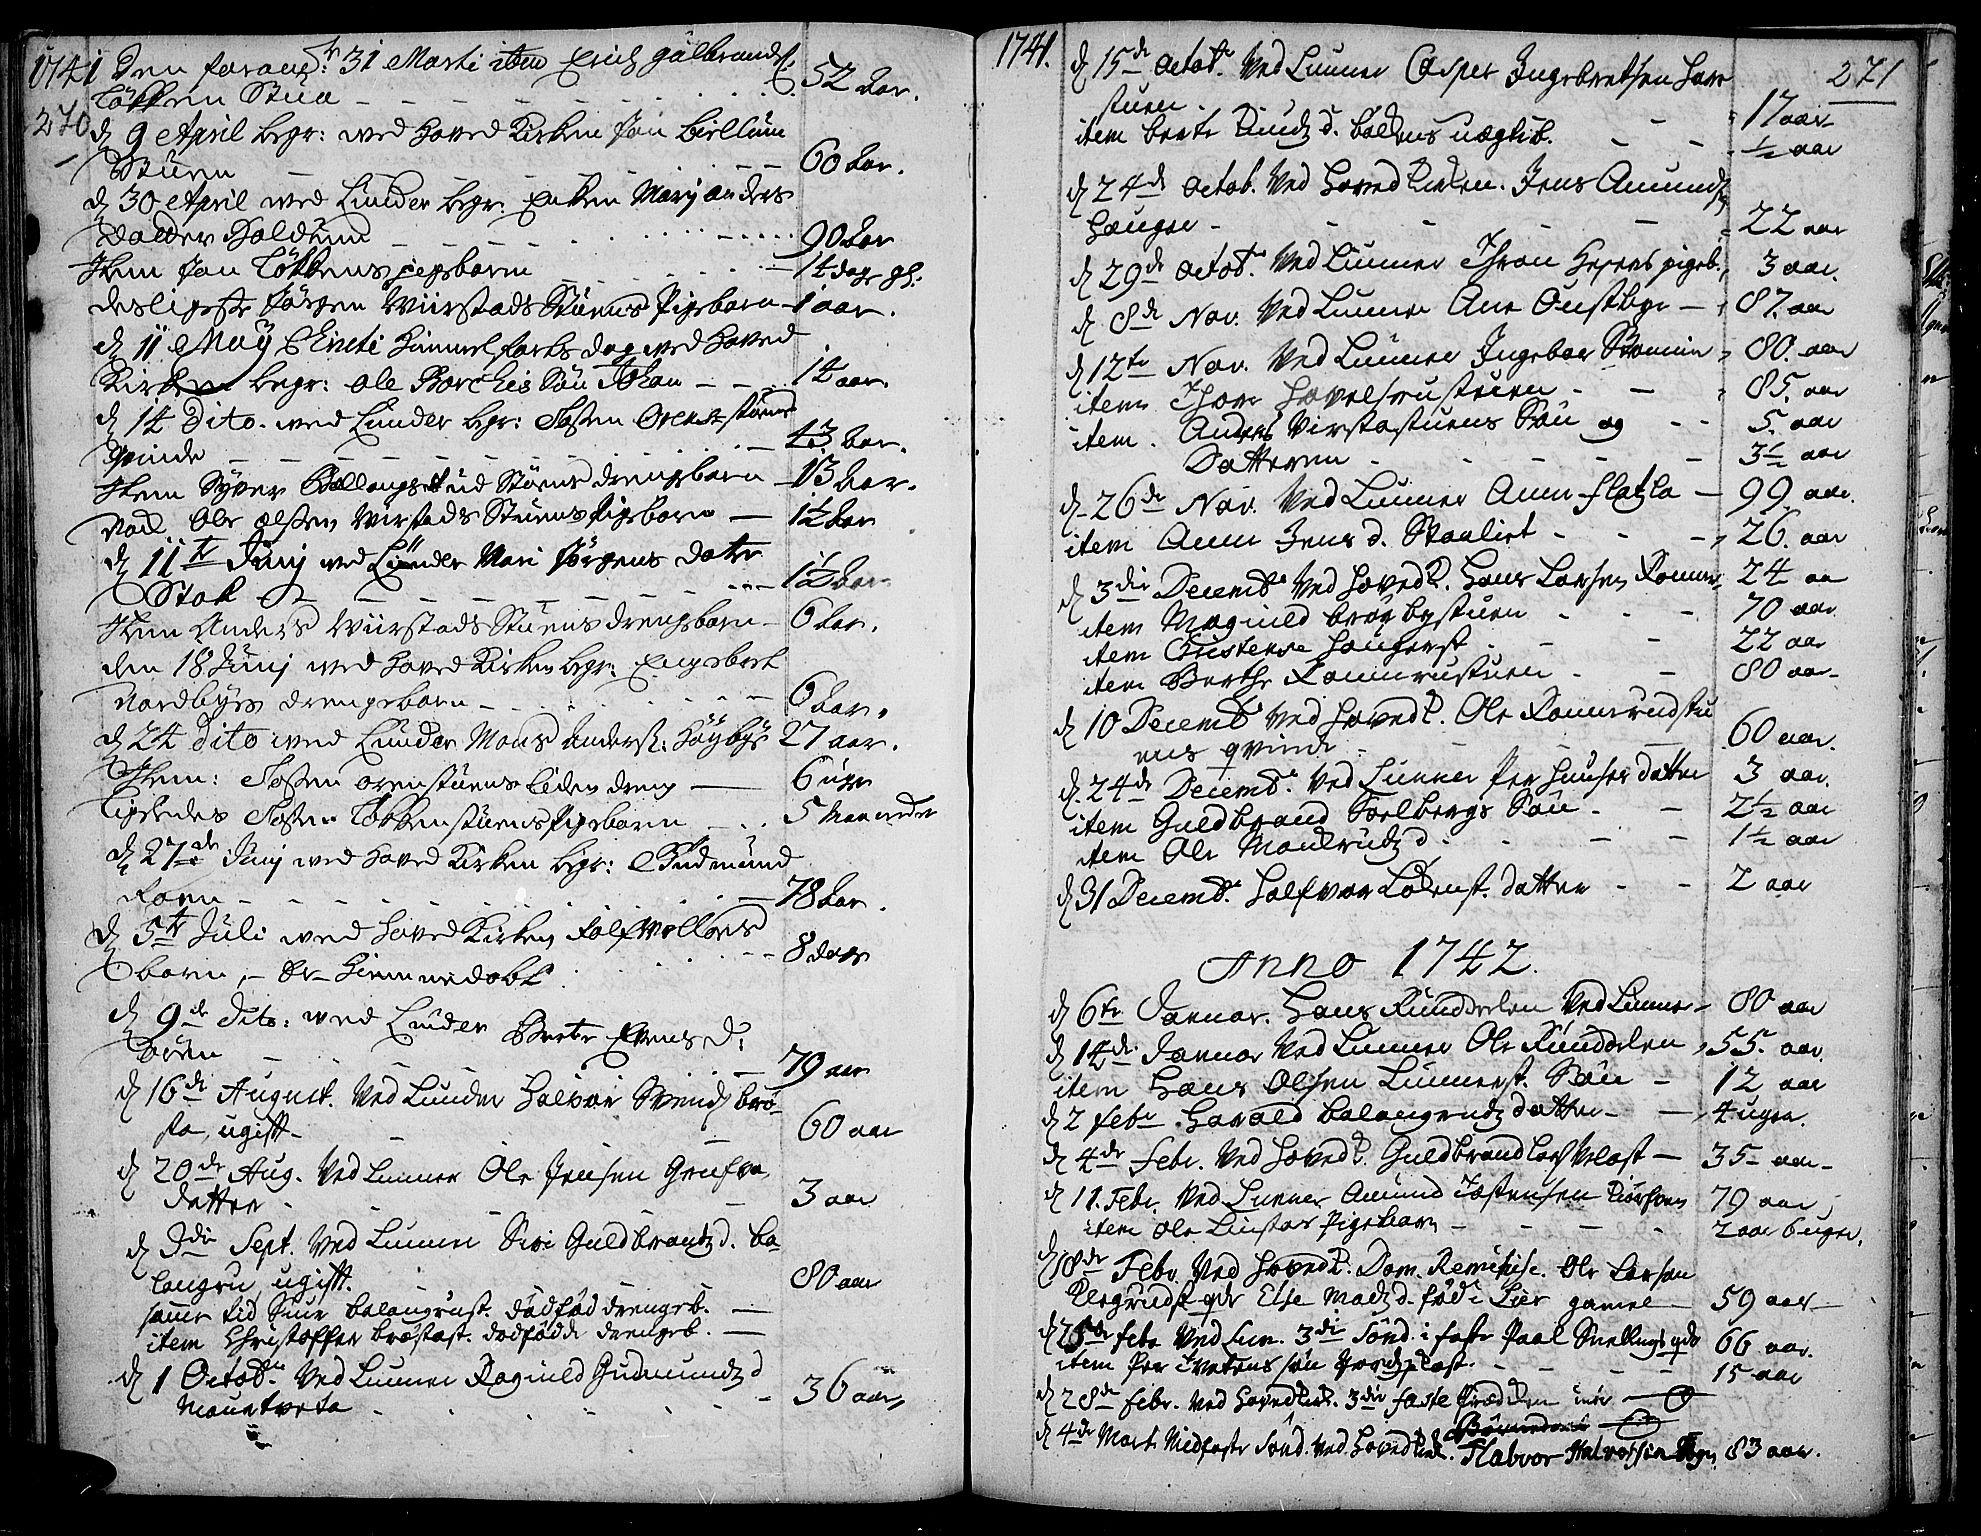 SAH, Jevnaker prestekontor, Ministerialbok nr. 2, 1725-1751, s. 270-271